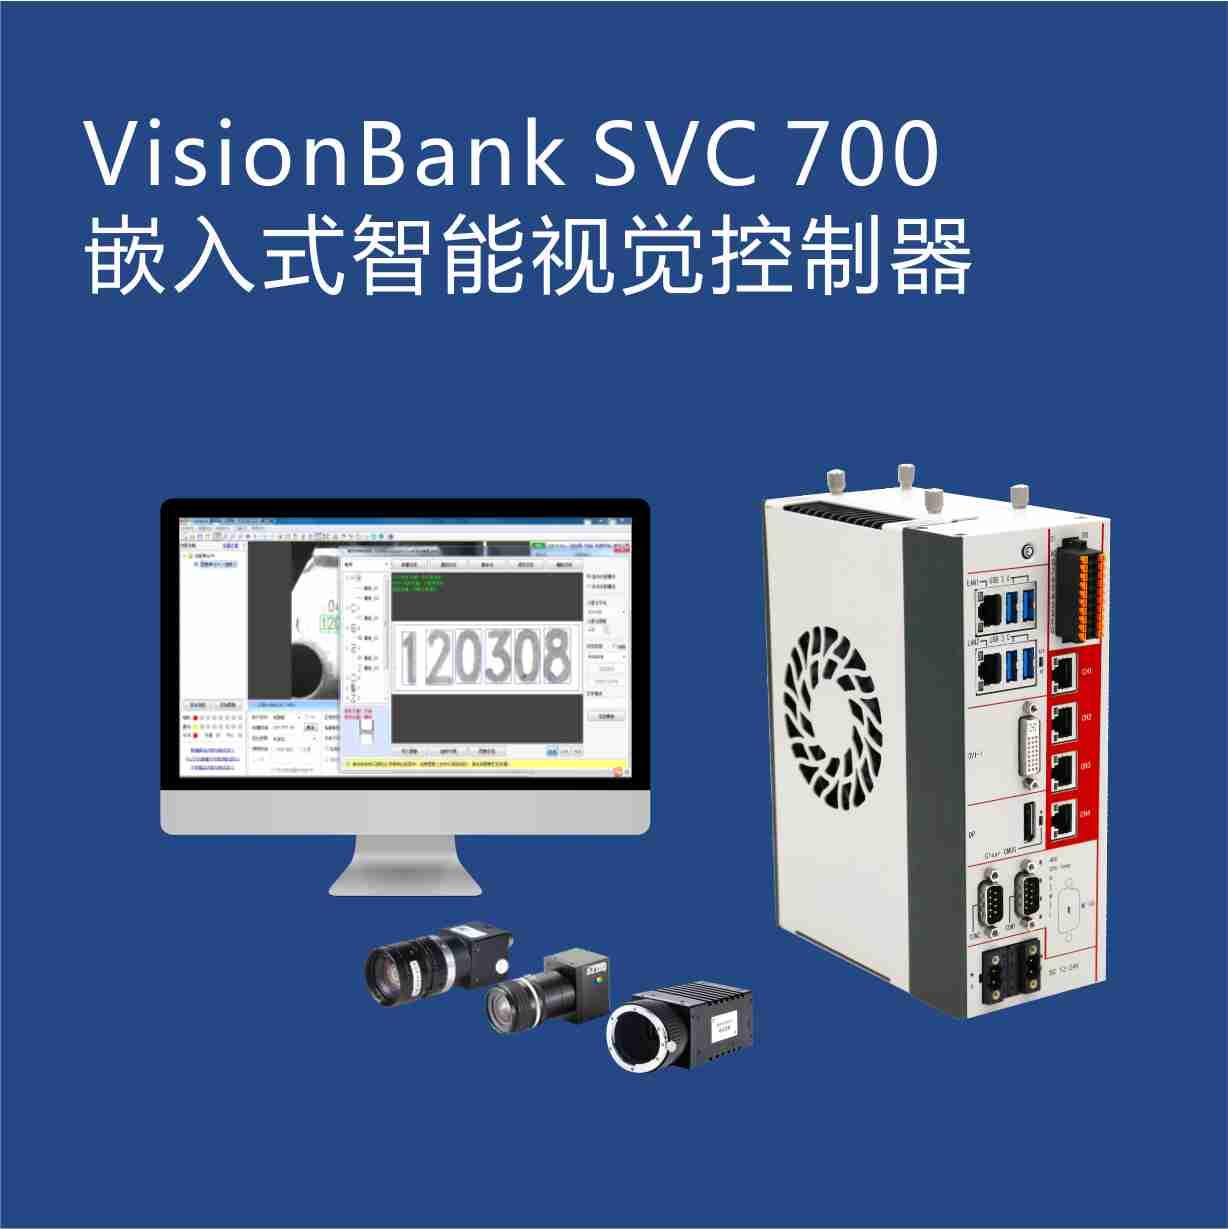 VisionBank SVC700 嵌入式智能视觉系统